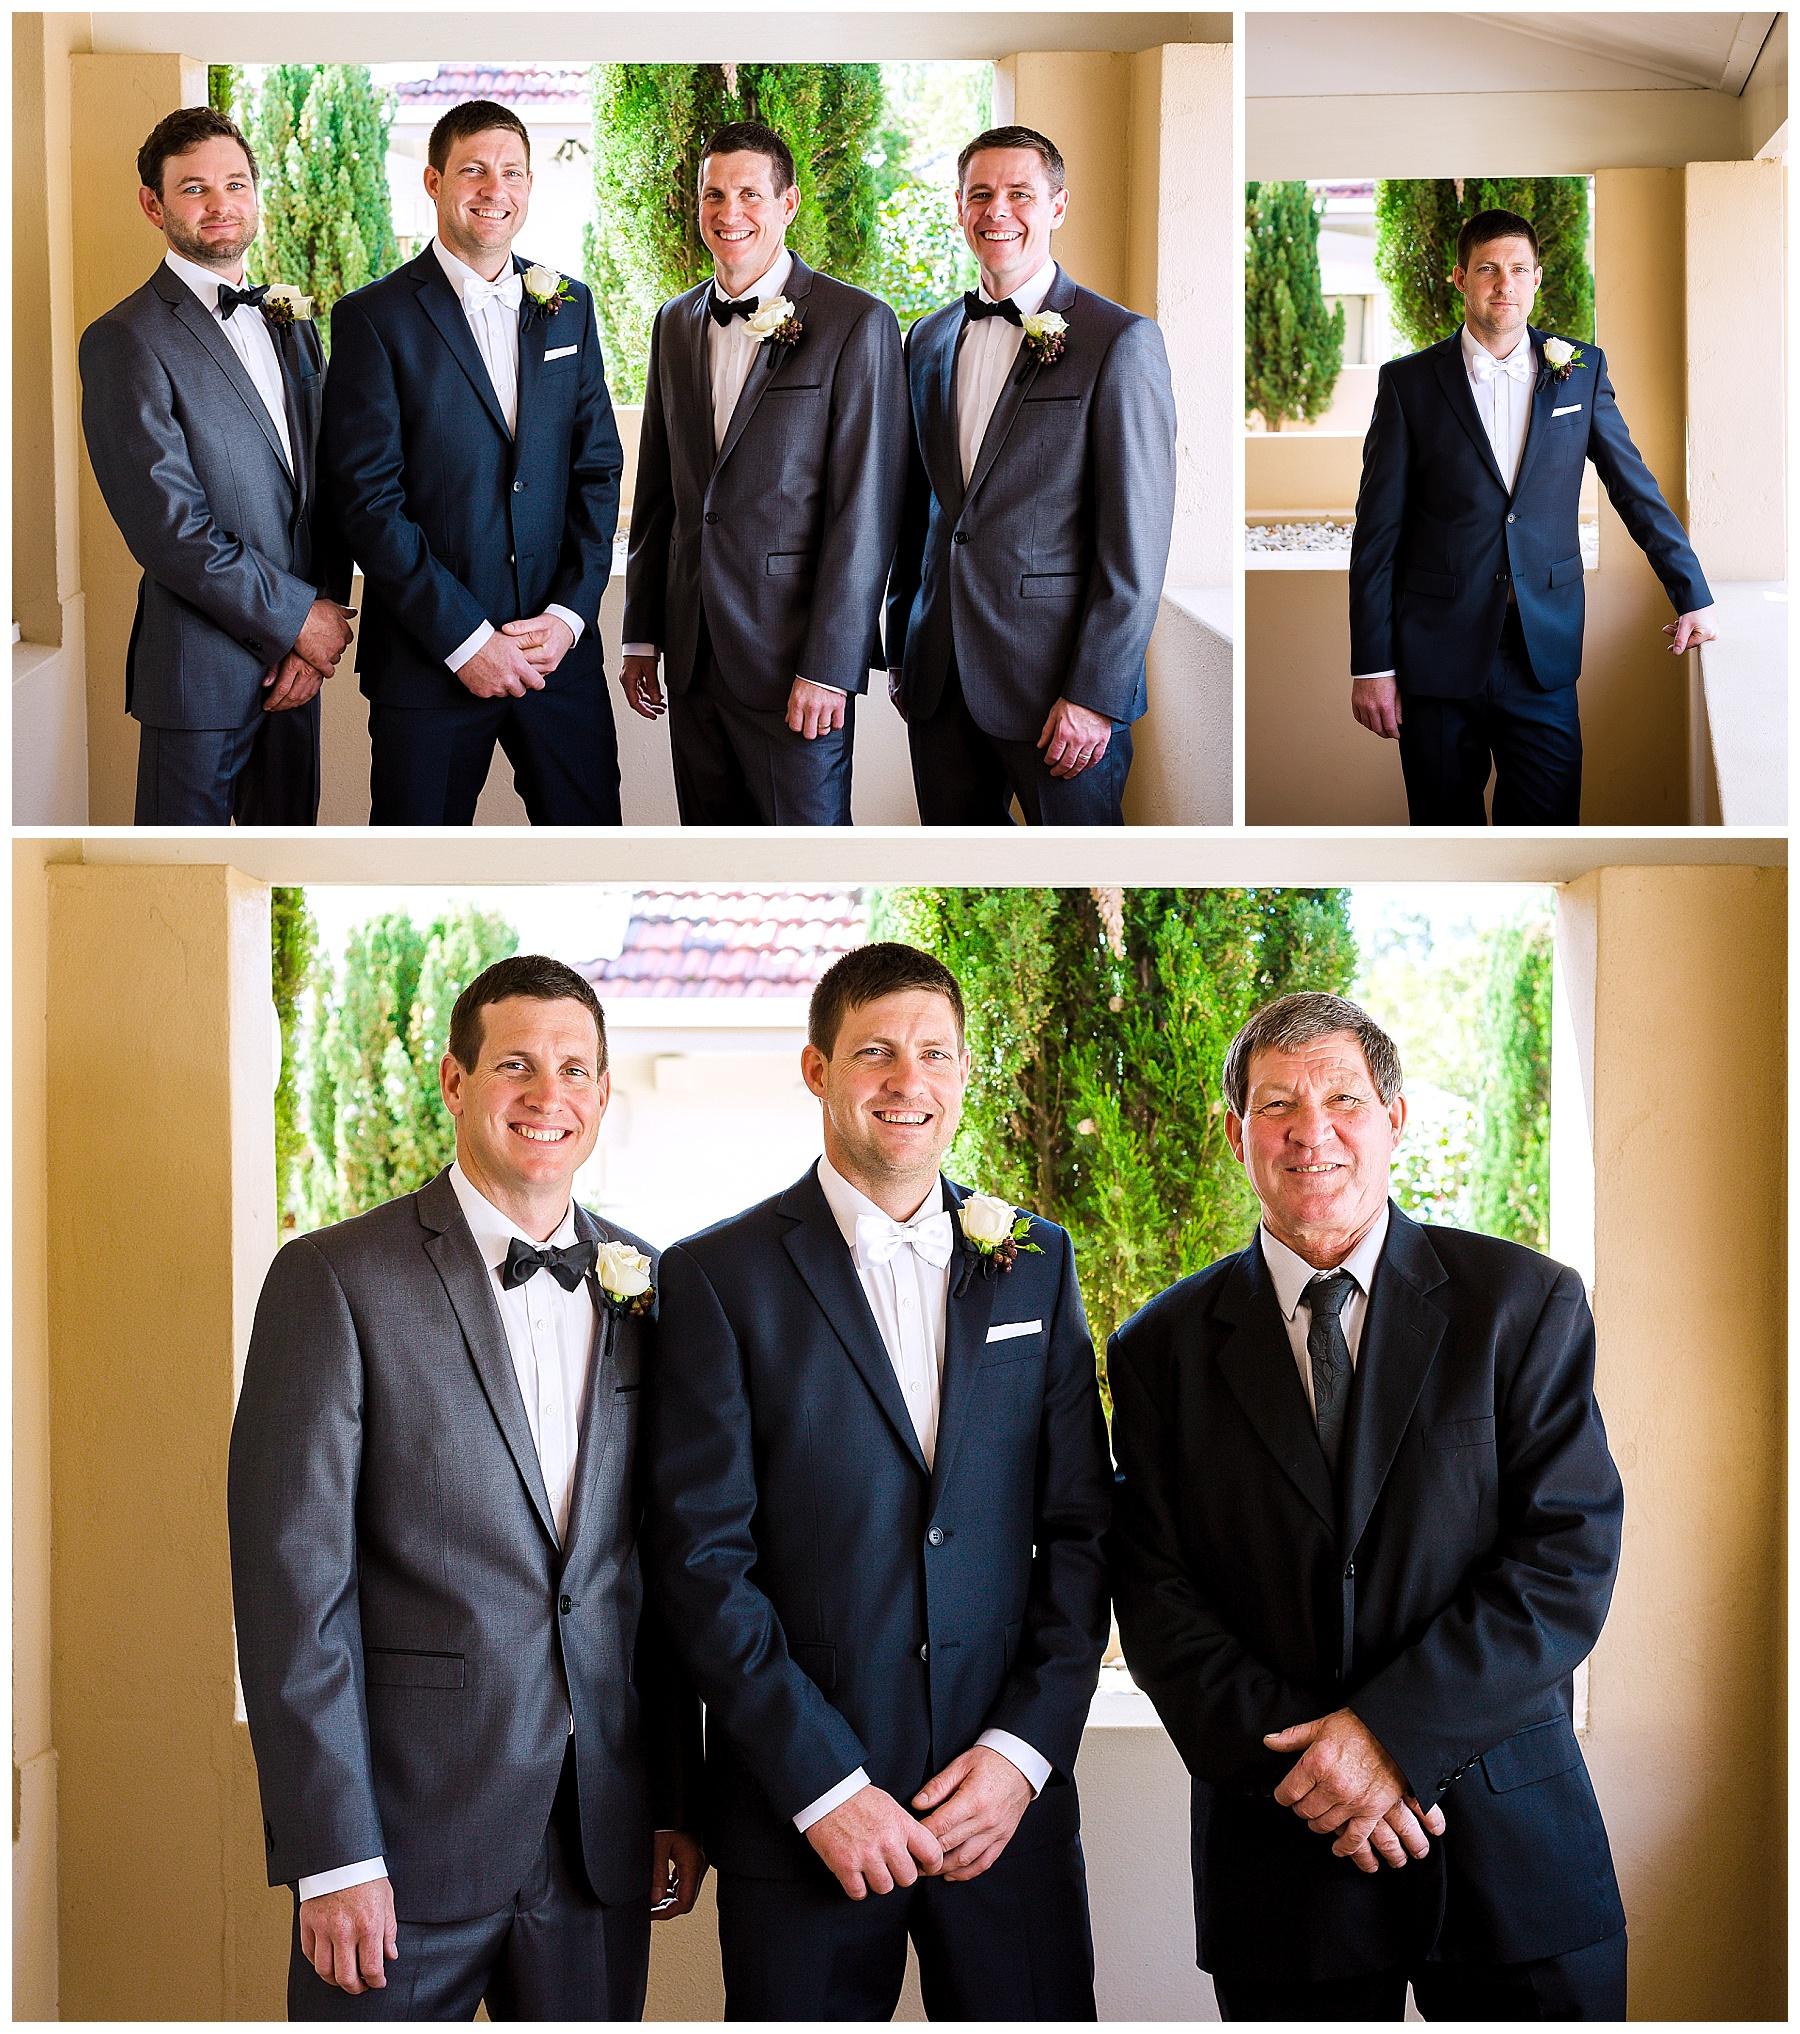 wedding suit with bowtie